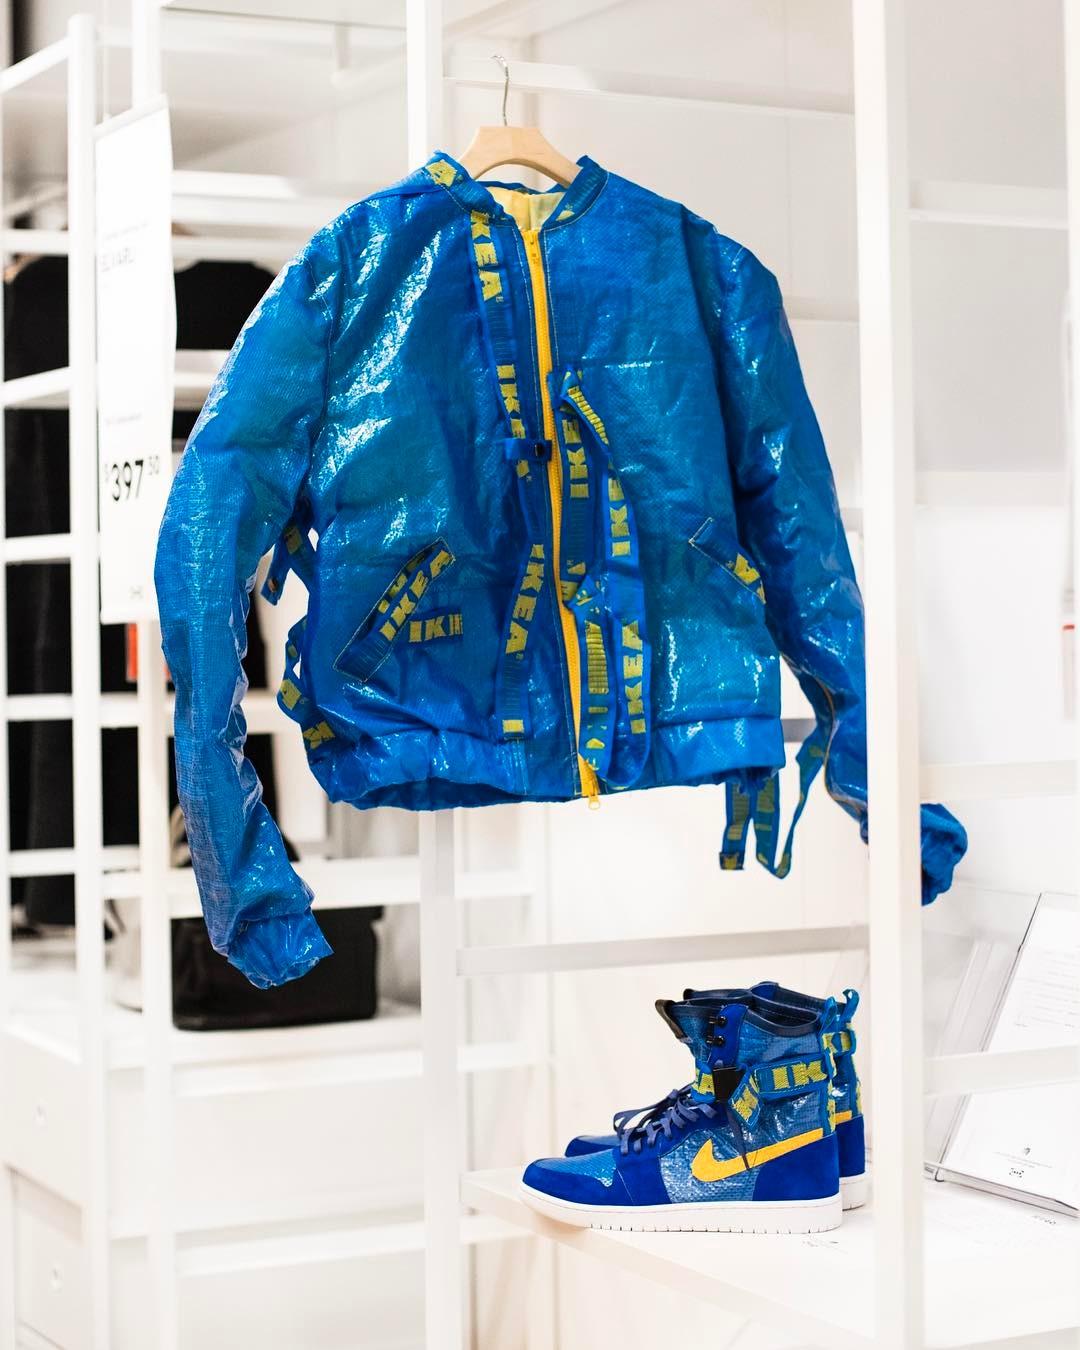 Is Shoe Surgeon Dominic Chambrone poking fun at Balenciaga with his IKEA pack bespoke Nike Jordans?